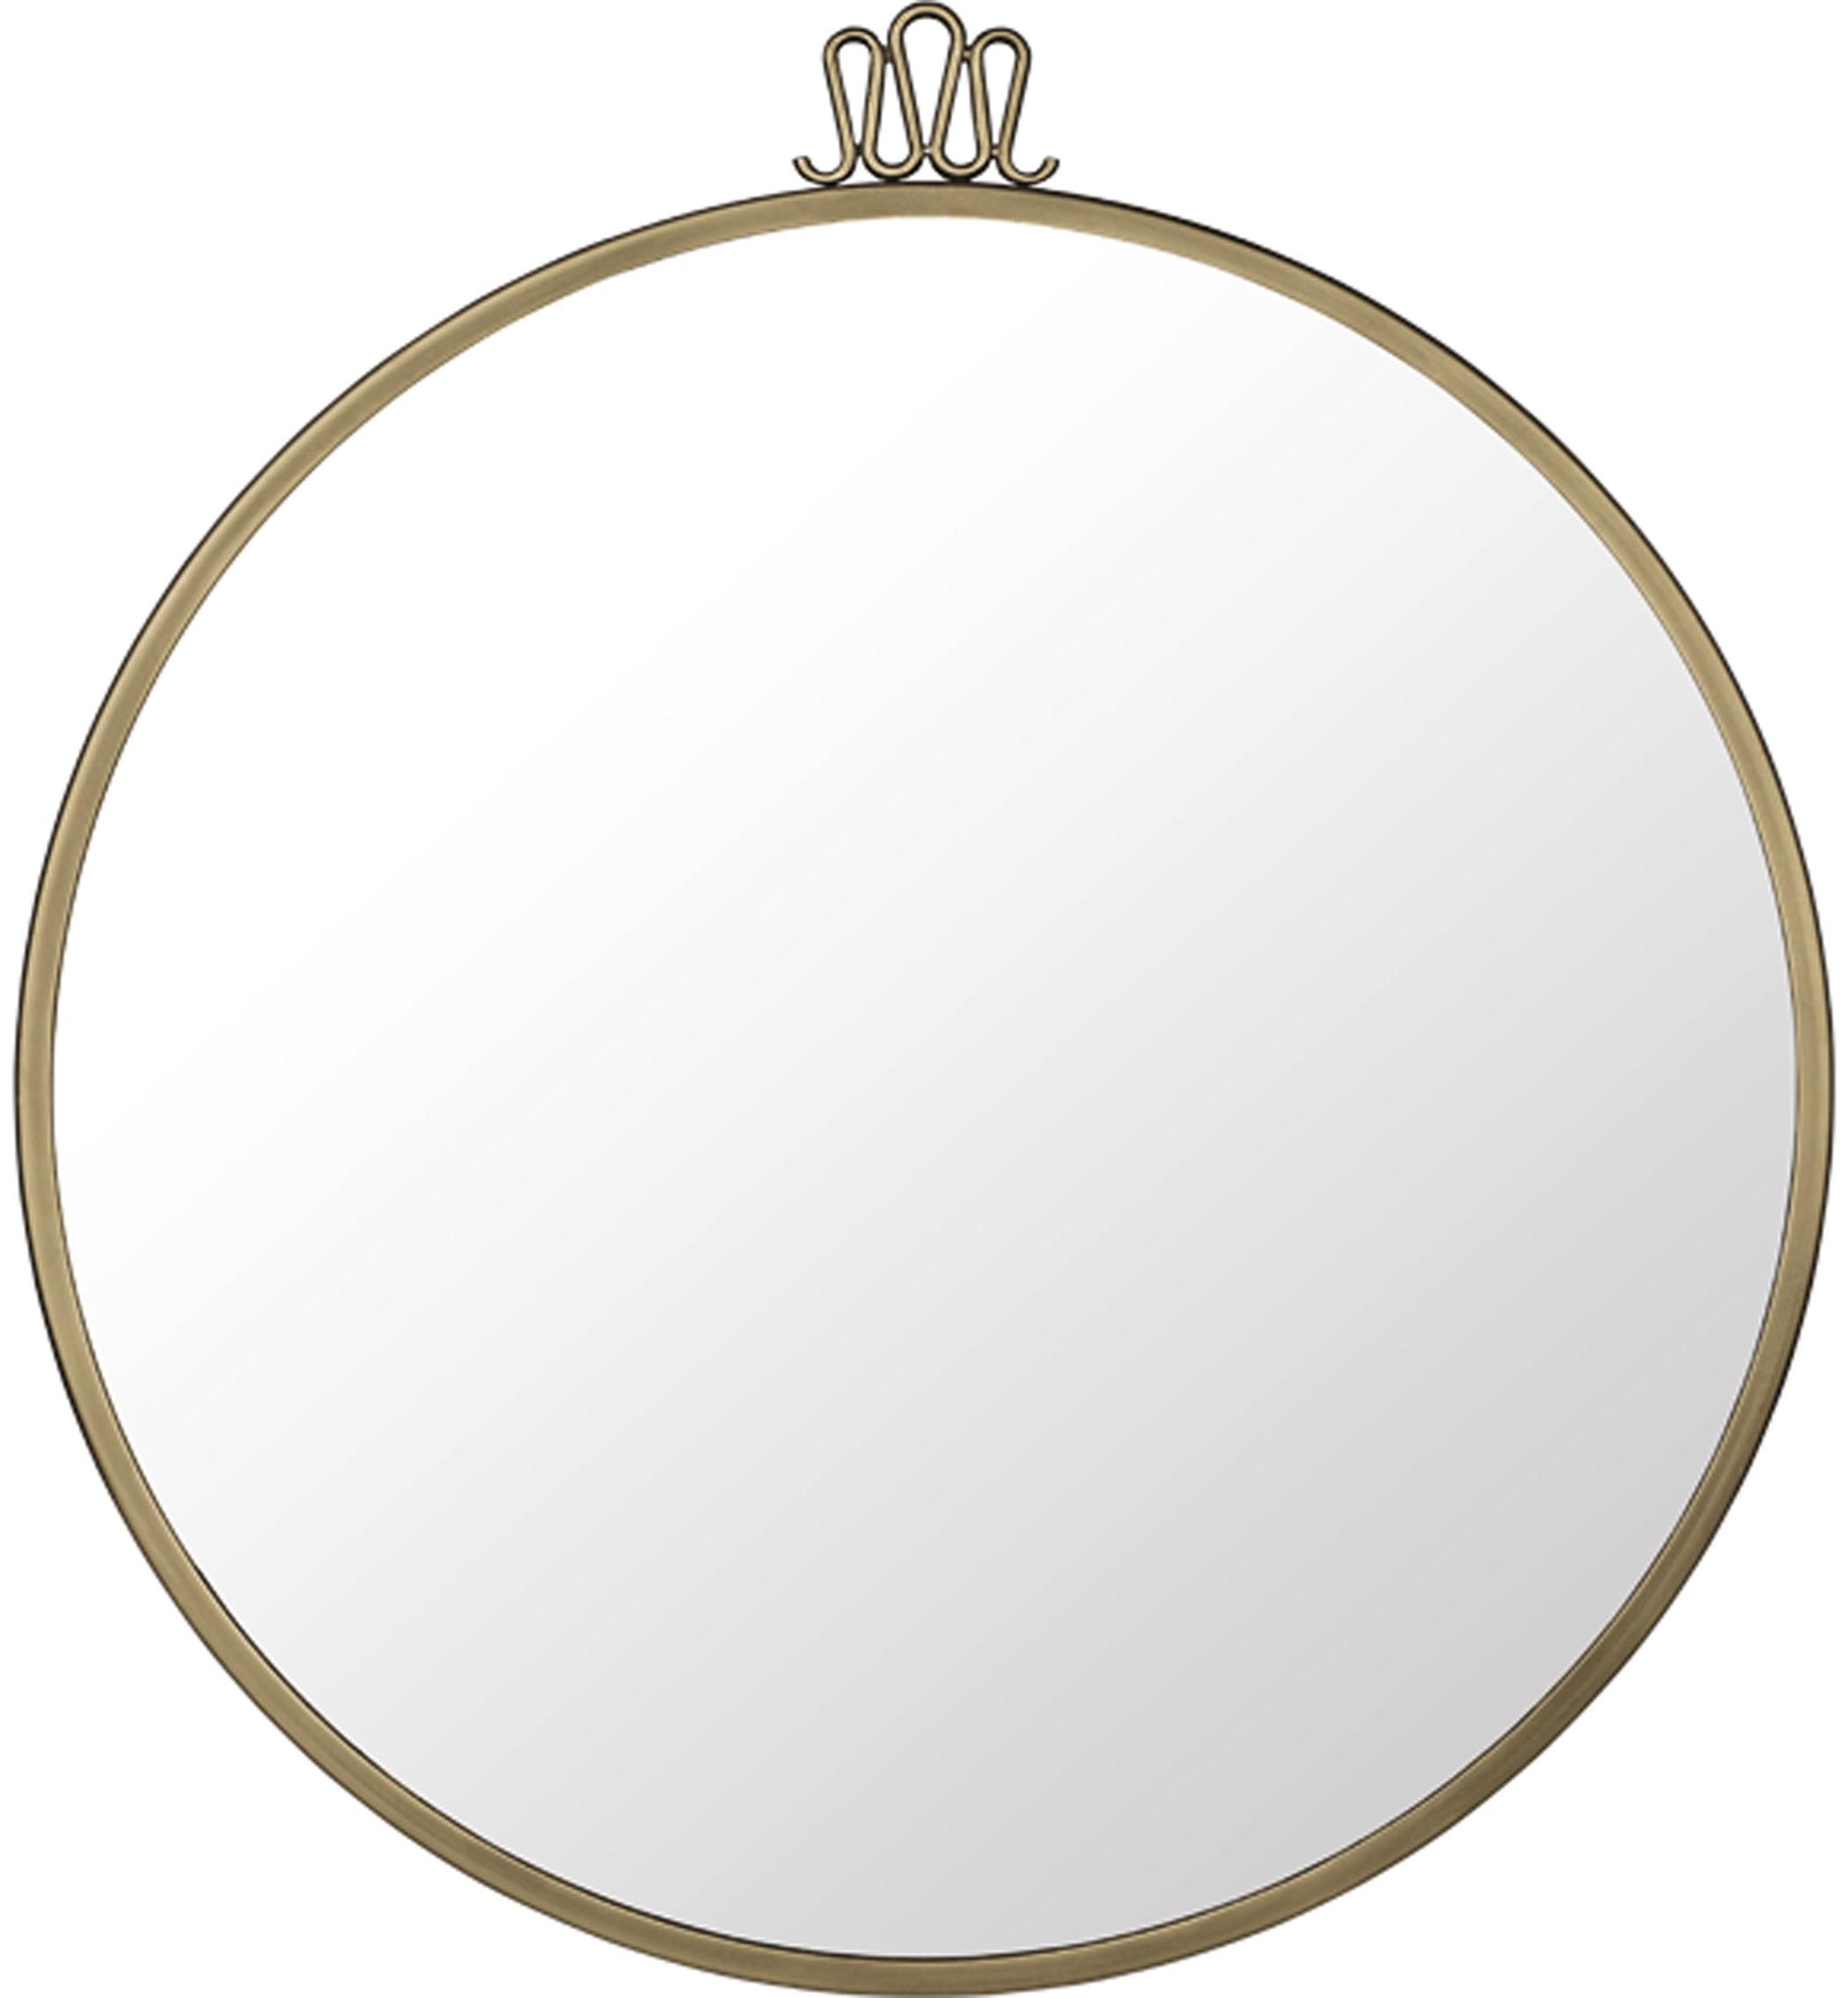 Randaccio Mirror 60 Antiquebrass Front Image